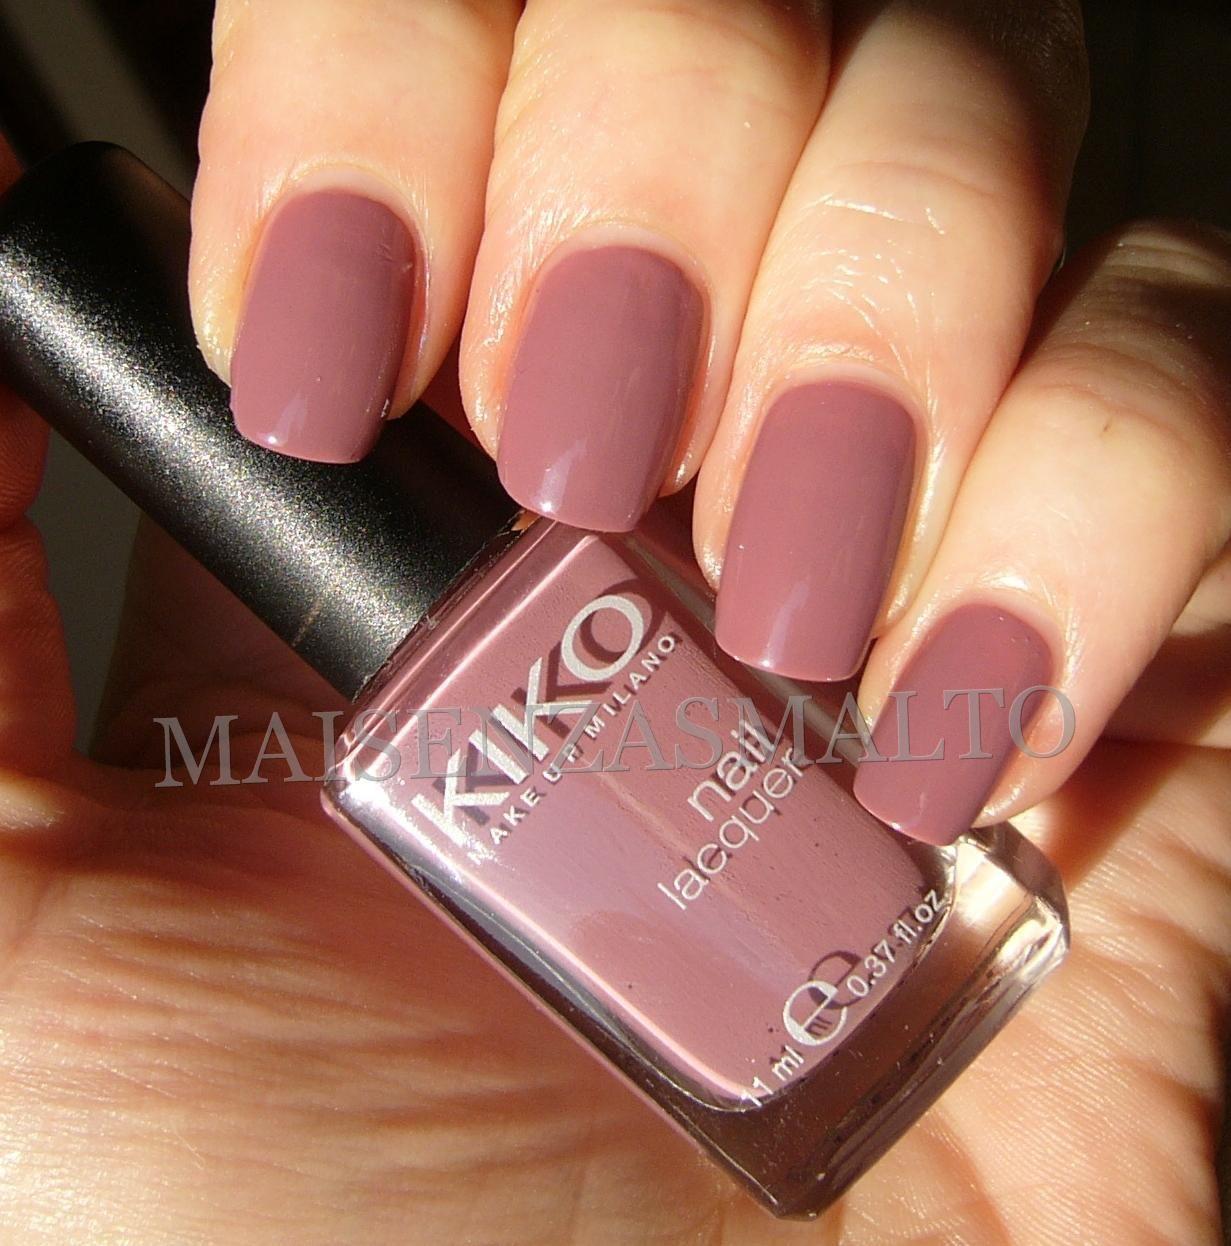 Kiko 318 su art maquillage pinterest makeup for Kiko 365 tattoo rose